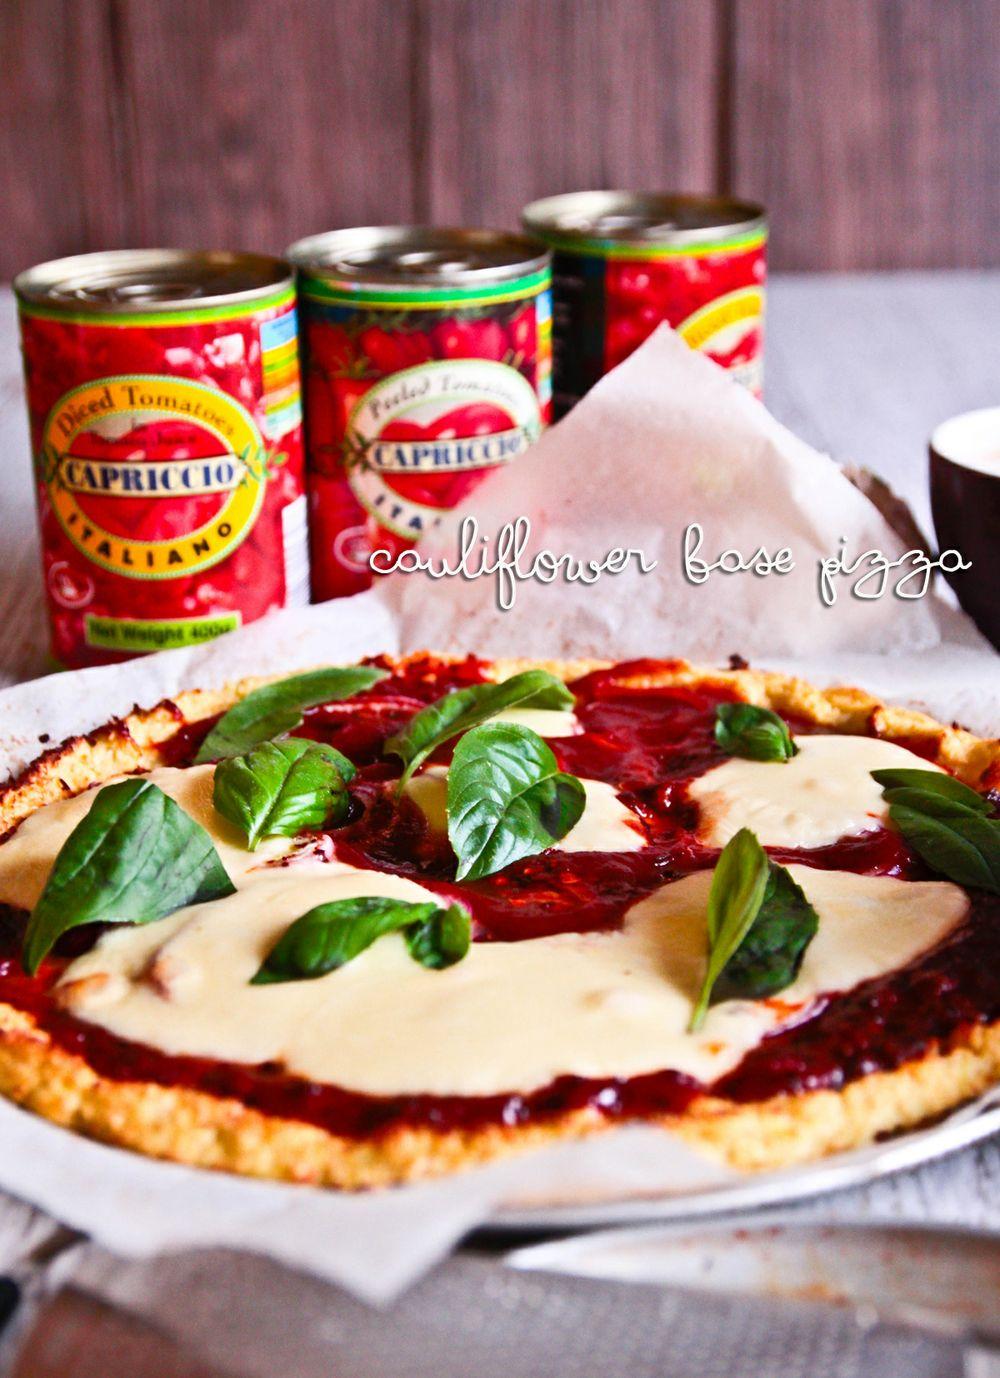 m-cauliflower-base-pizza-00